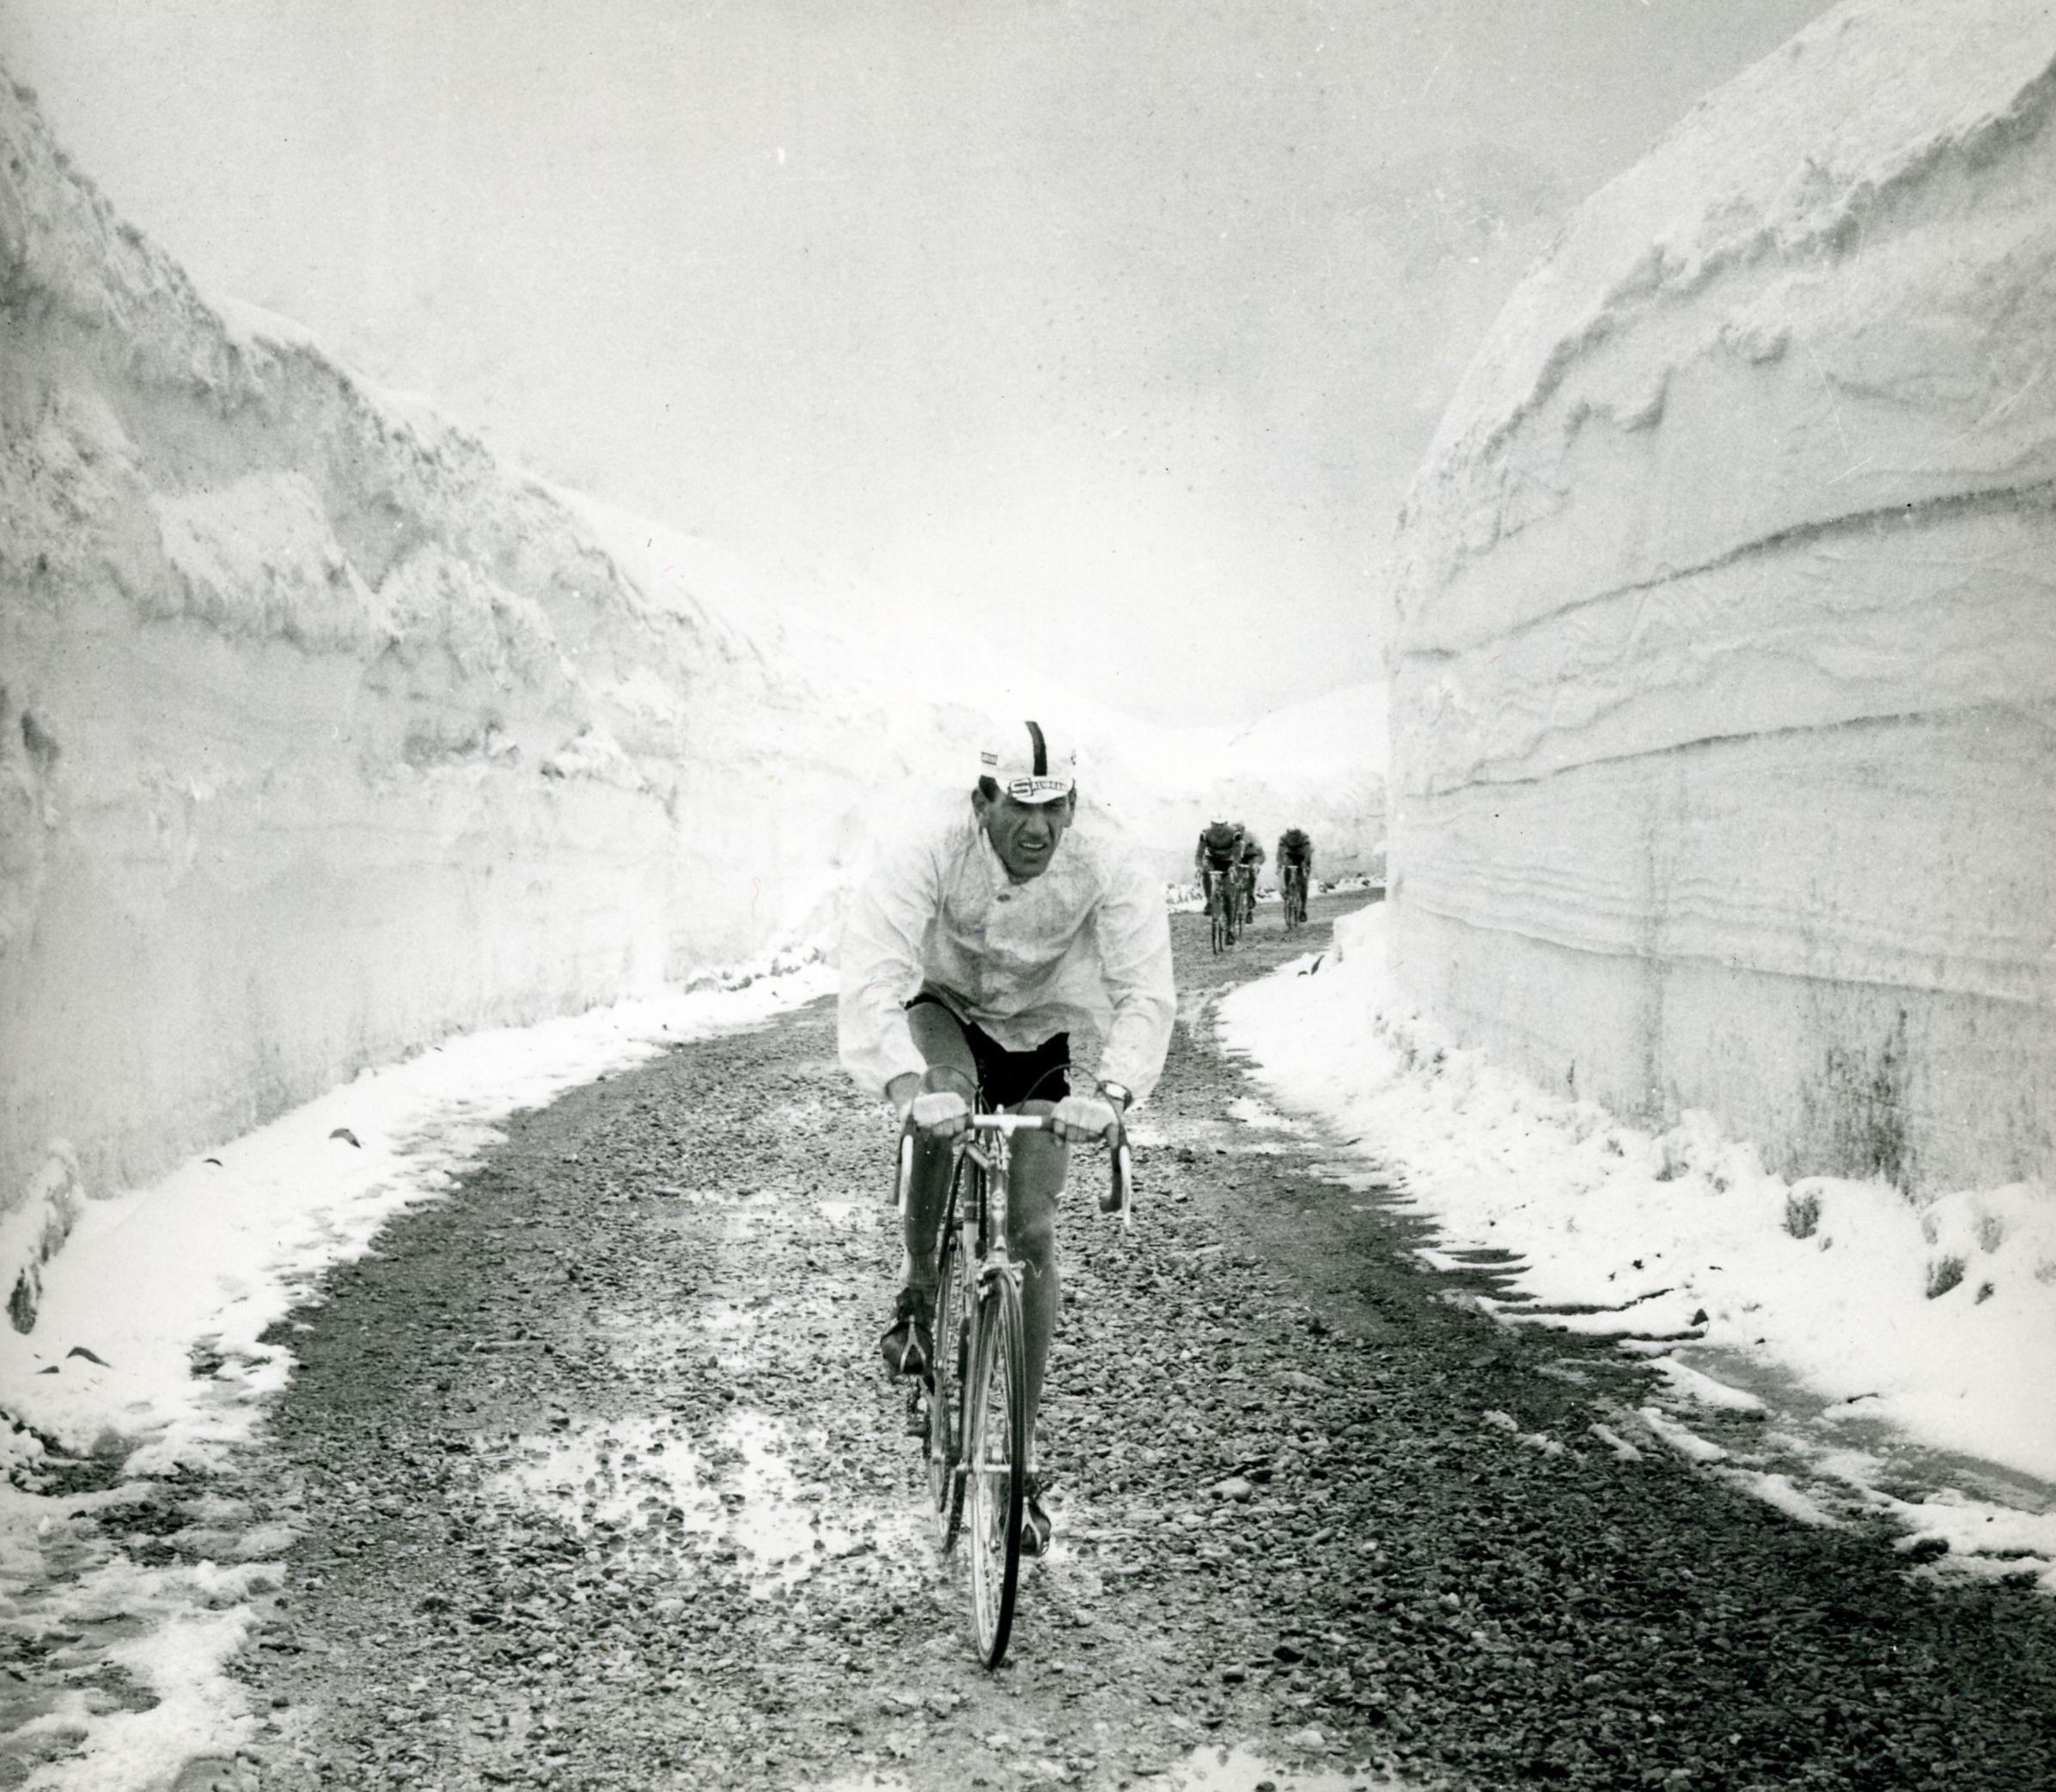 Vittorio Adorni Http En Wikipedia Org Wiki Vittorio Adorni Cycling Pictures Cycling Posters Cycling Photography